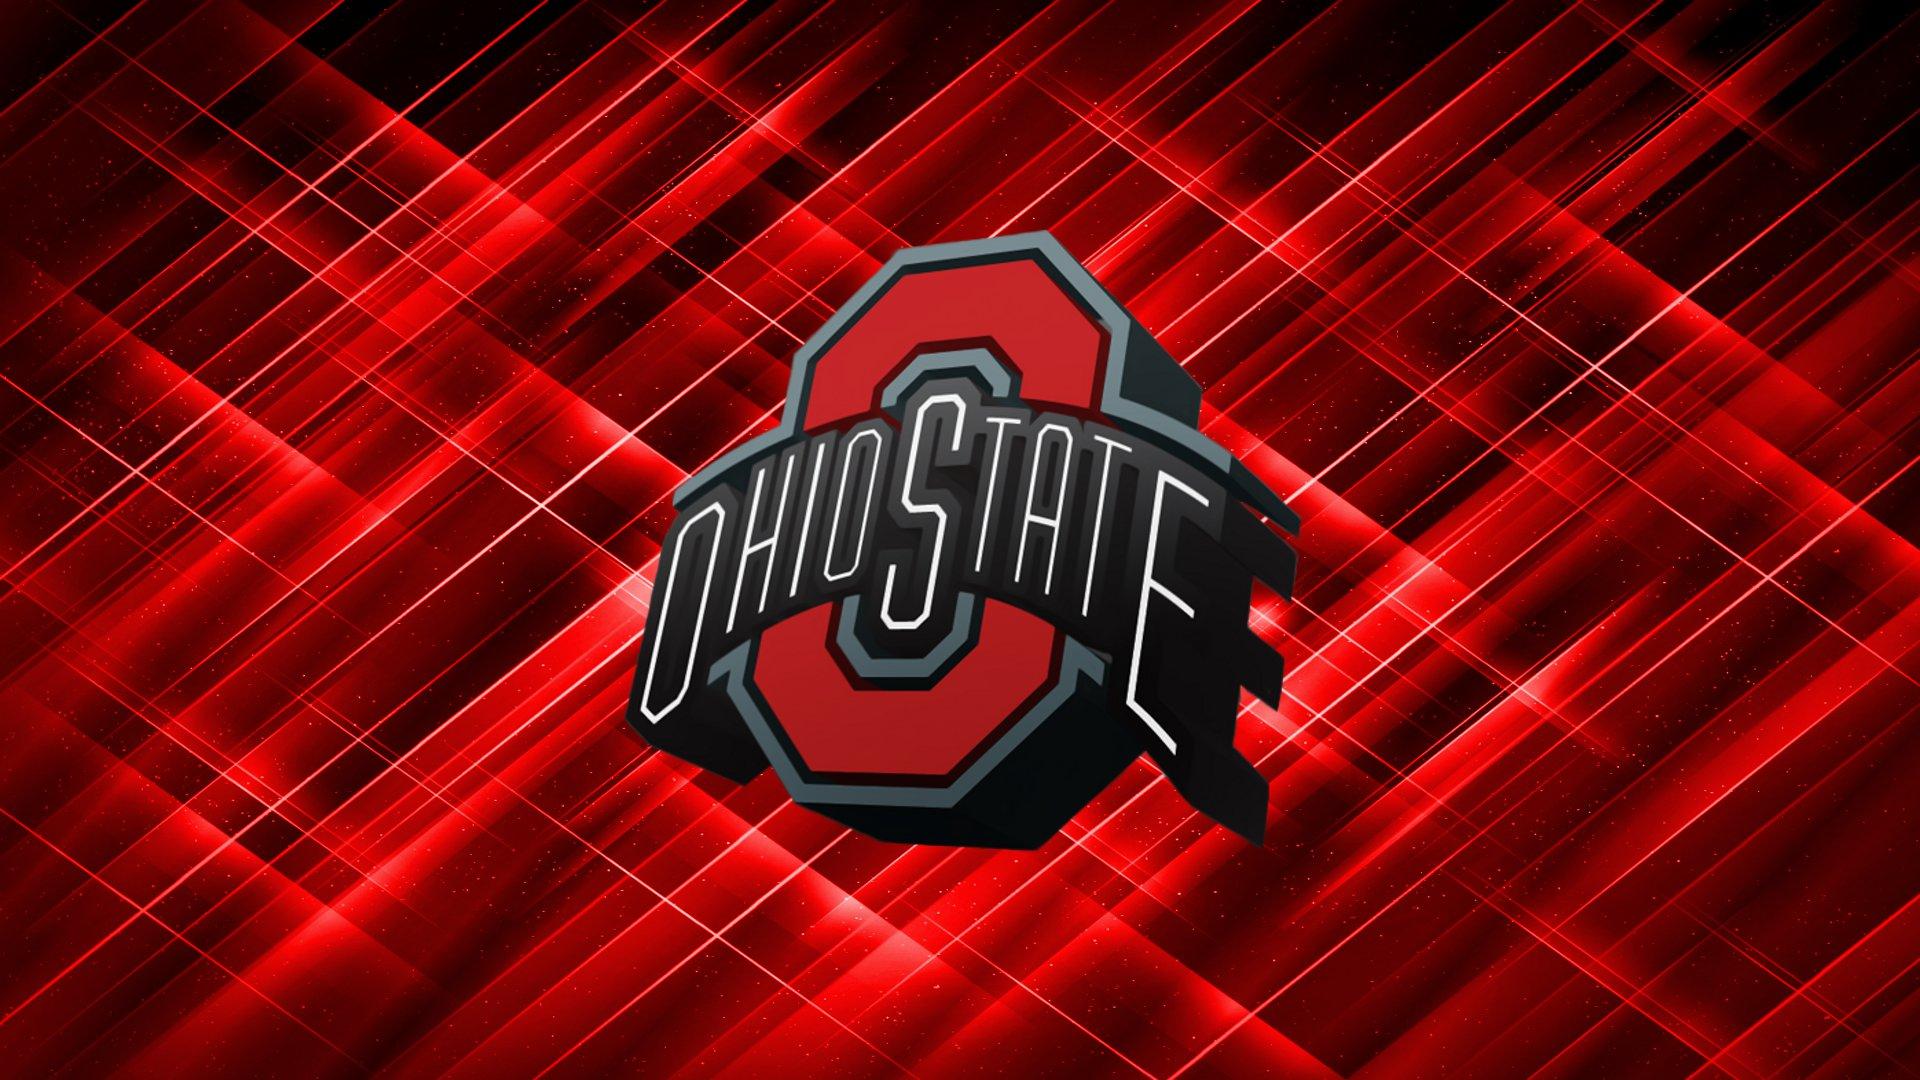 Ohio state wallpapers for desktop wallpapersafari - Ohio state football wallpaper ...